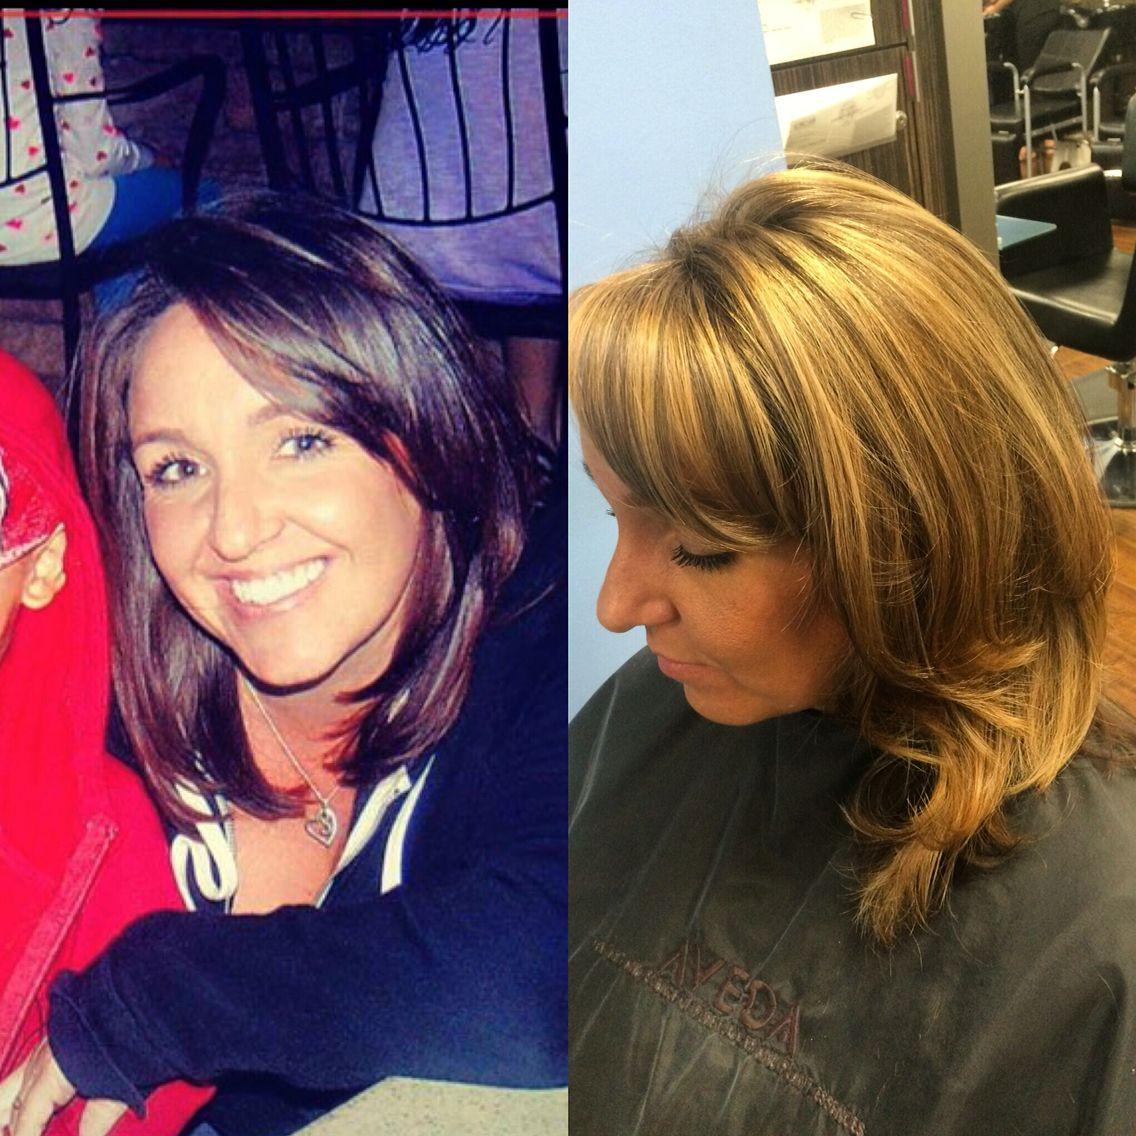 Brunette to blonde transformation #transformation #brunette #blonde ...